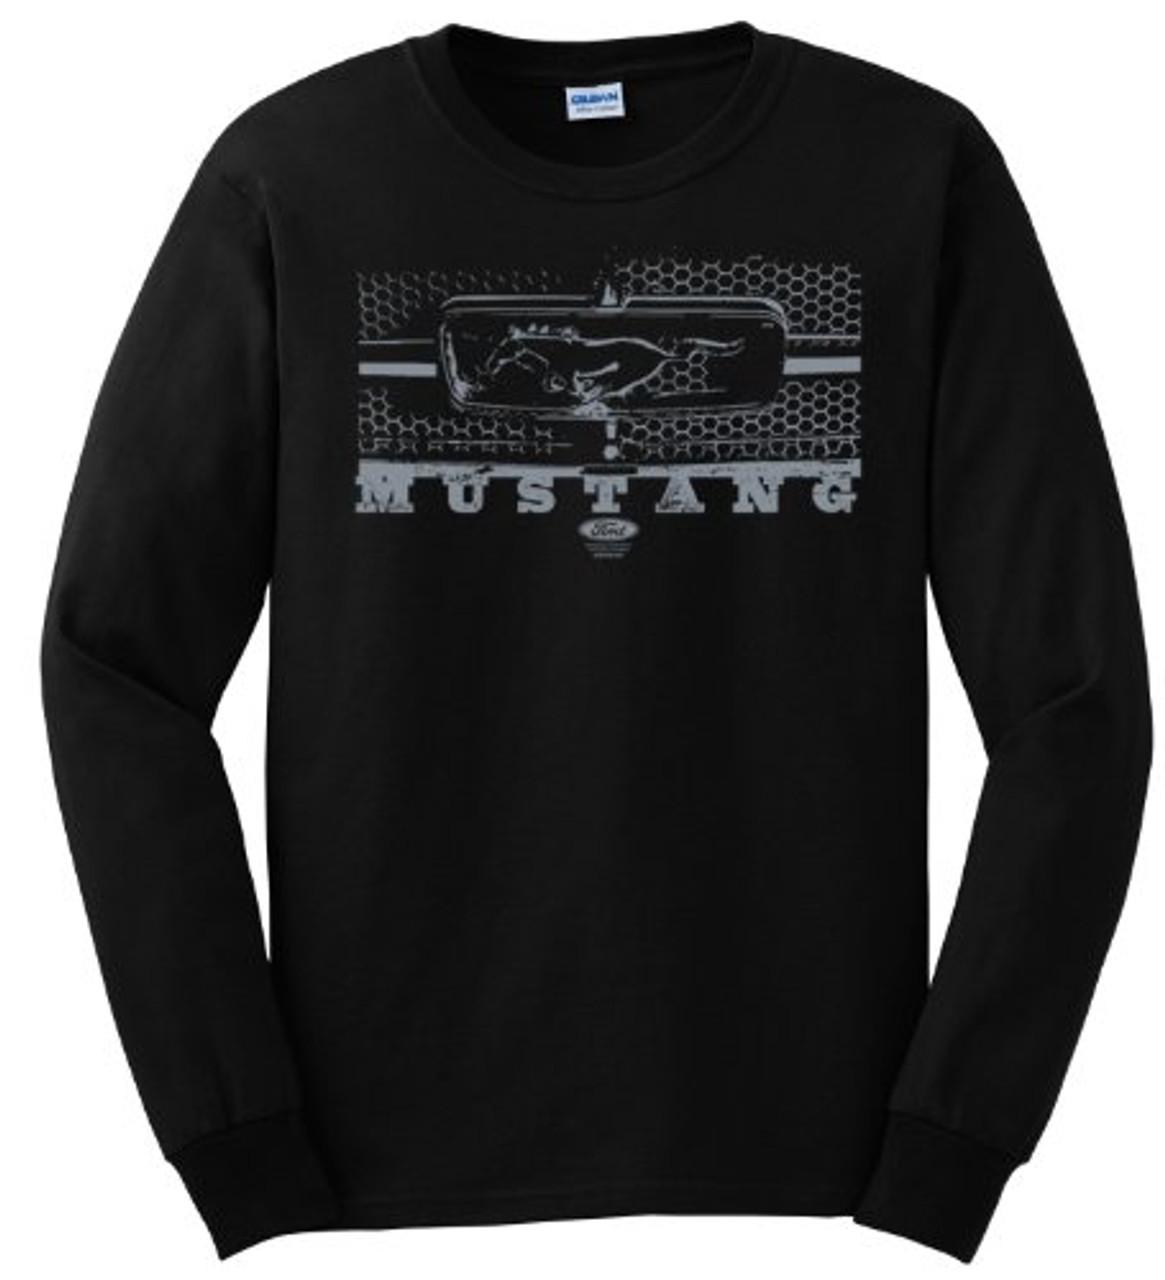 eb02658e Ford Mustang Longsleeve T-shirt Grill Design - Trenz Shirt Company